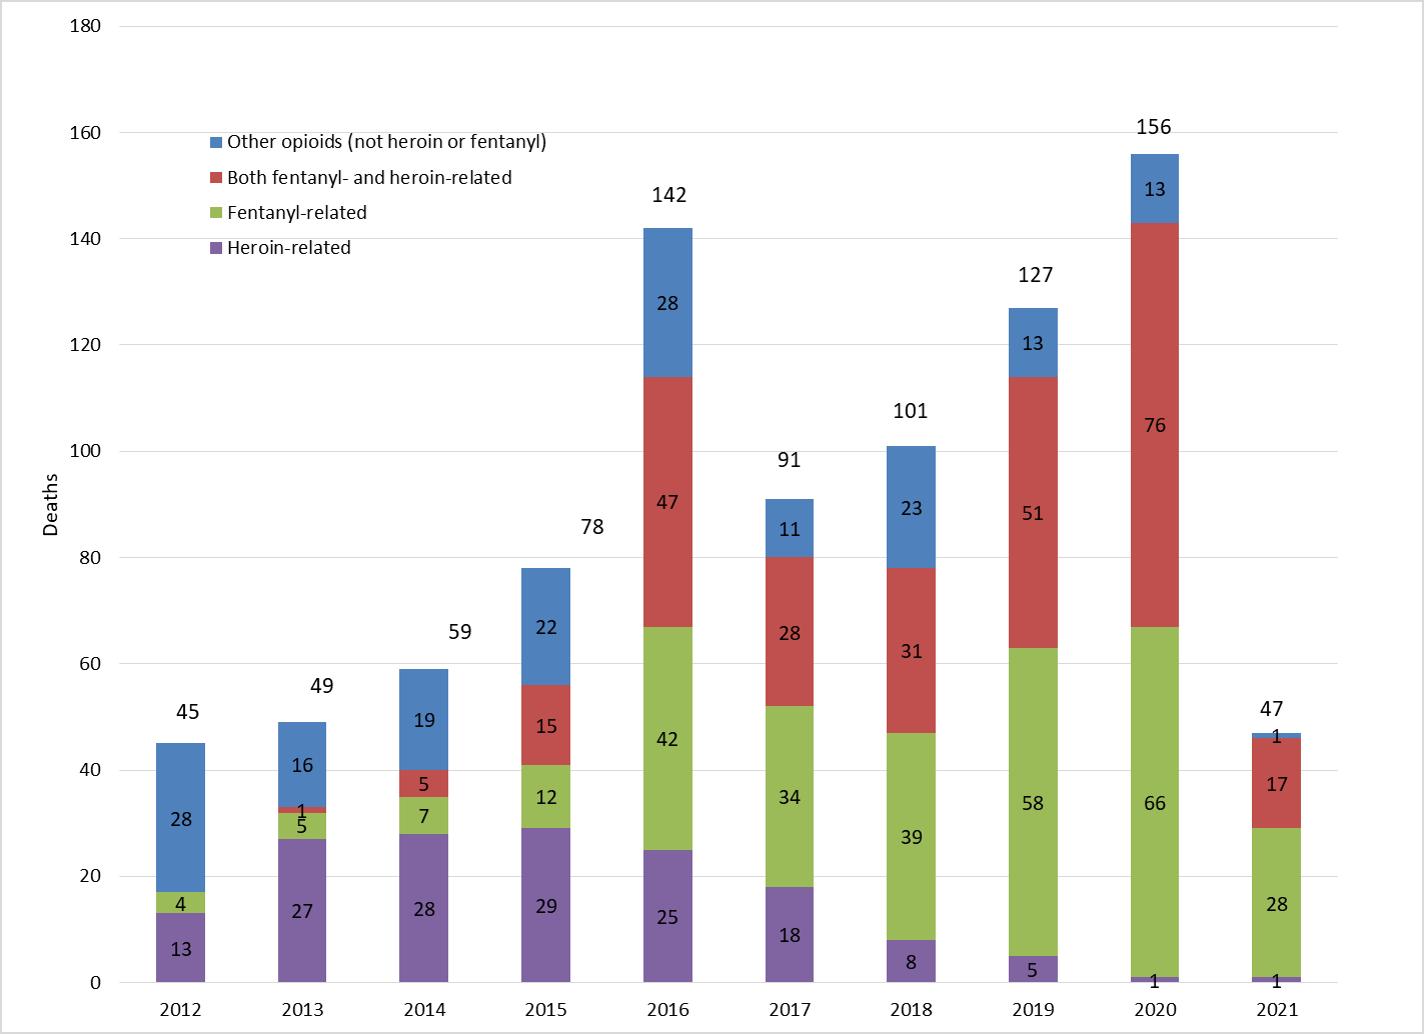 Overdose Deaths per Year